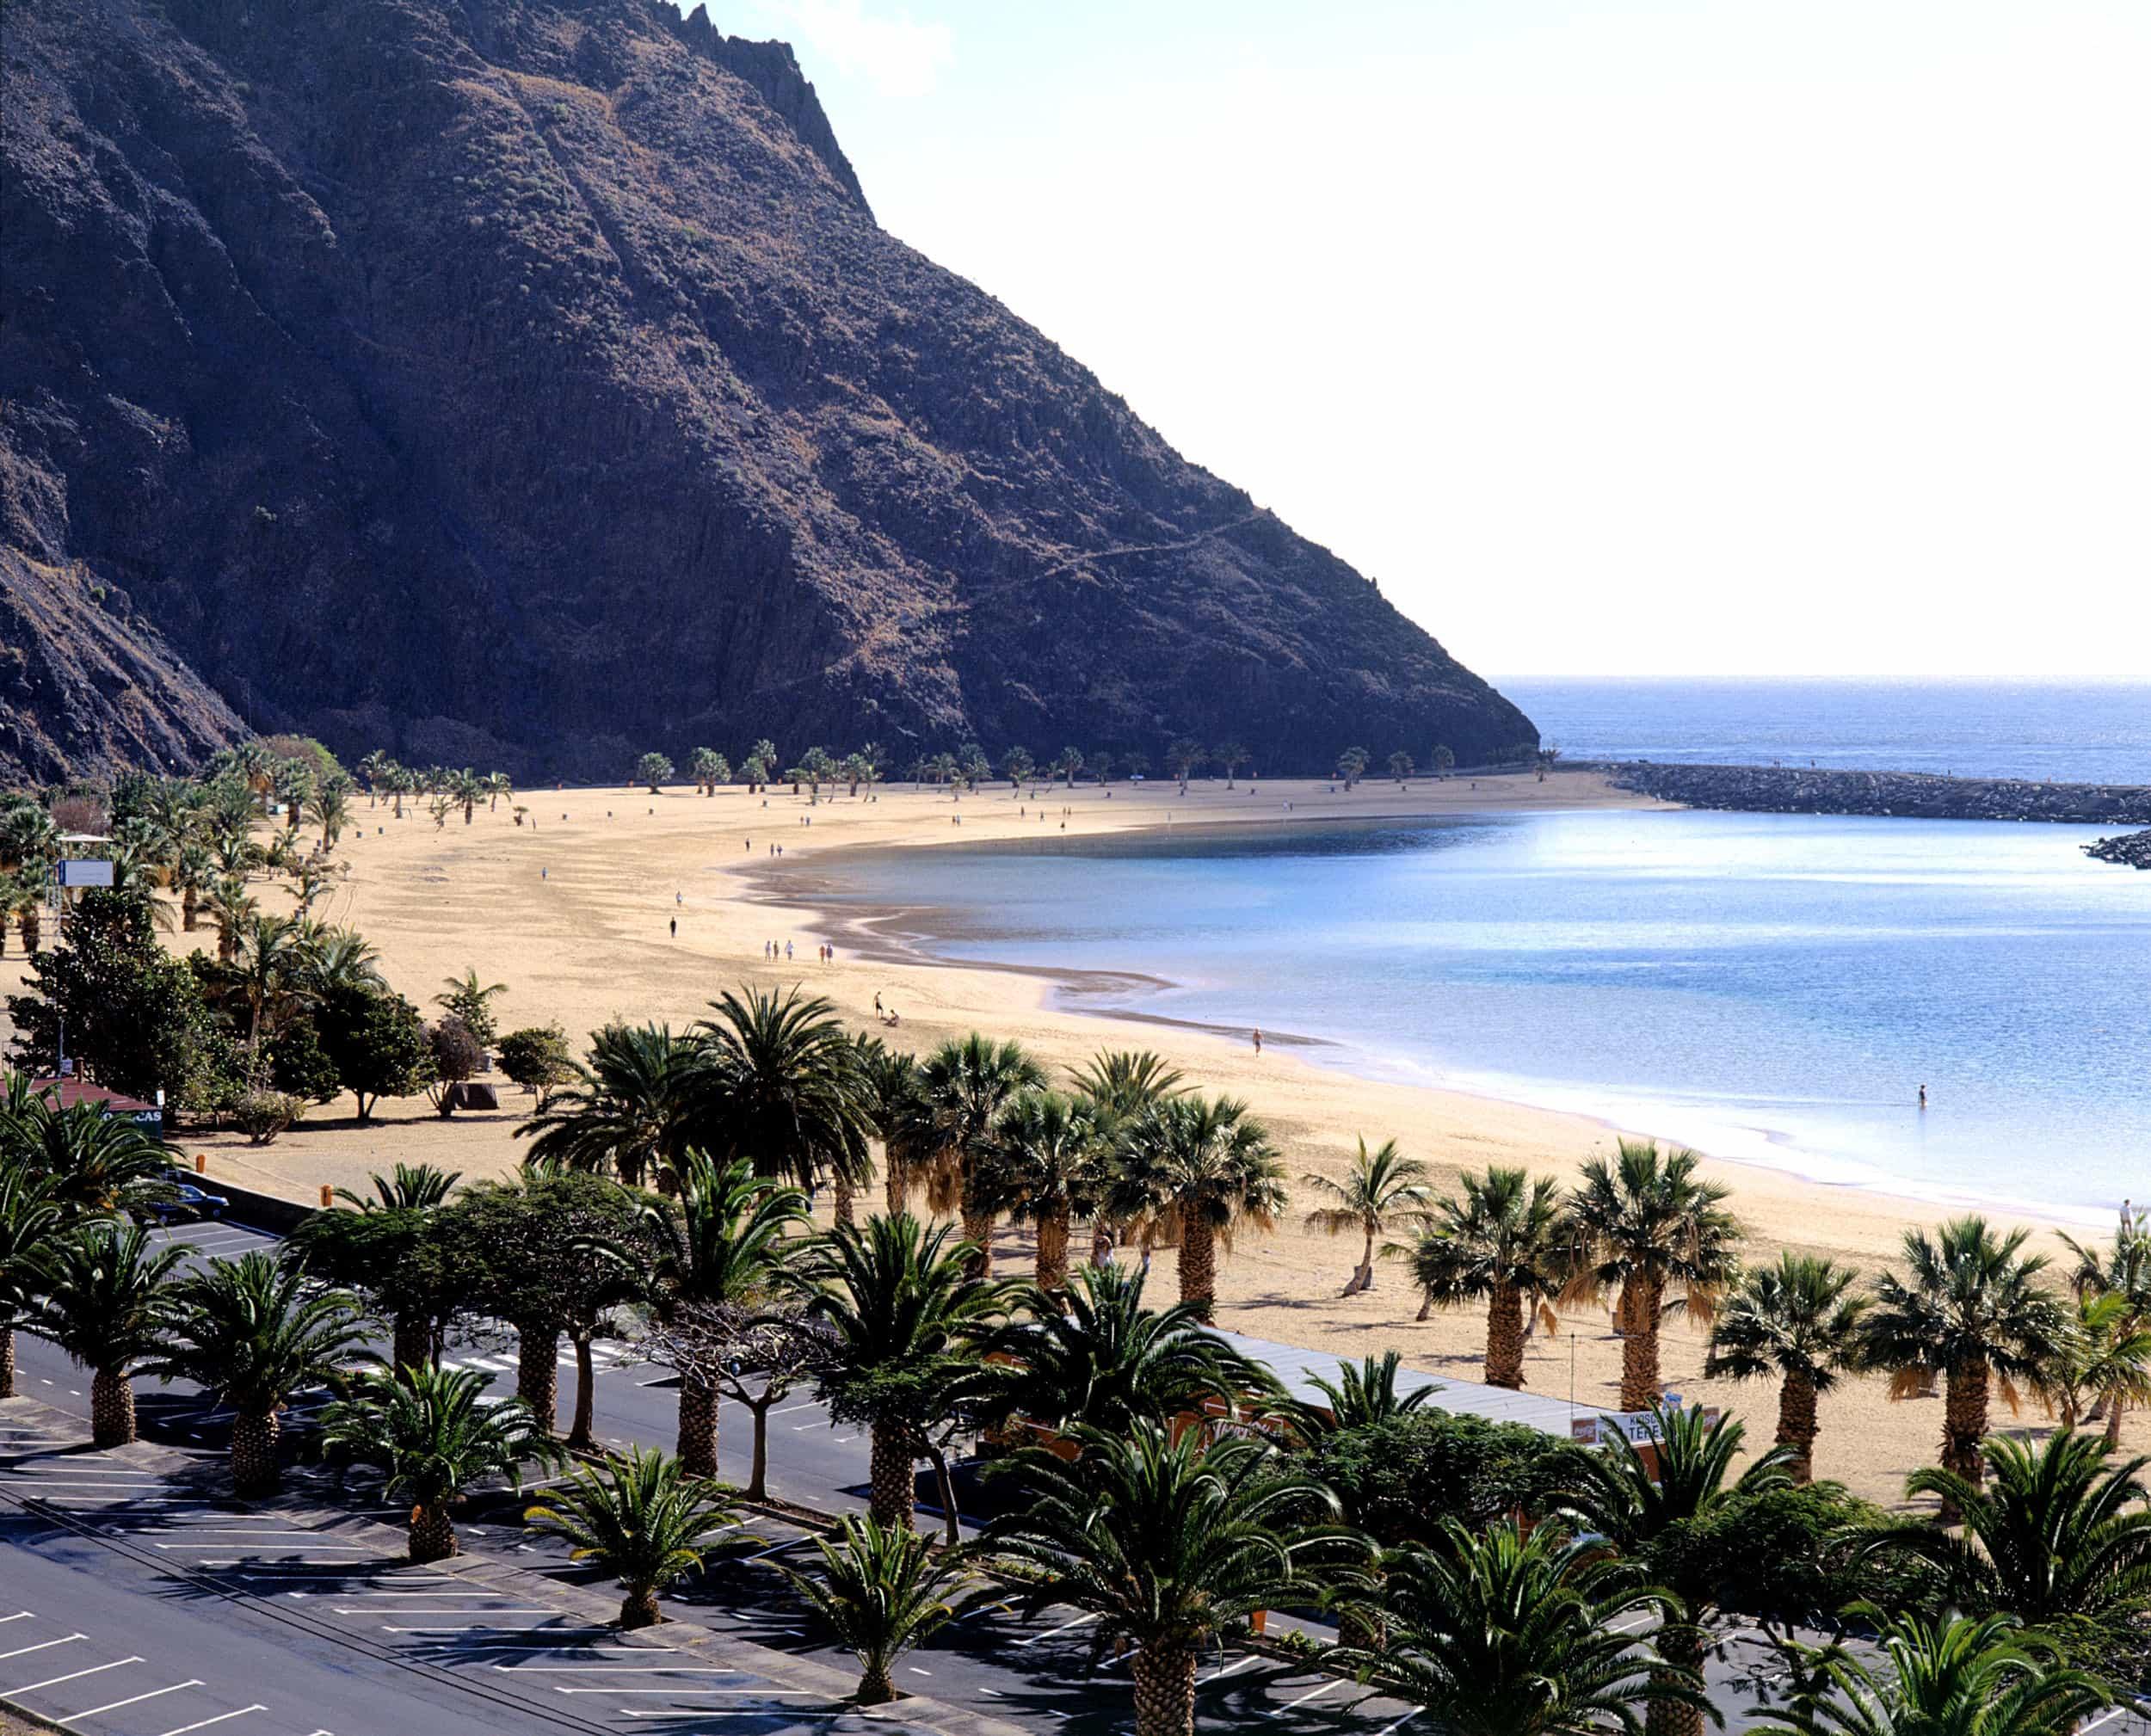 Tenerife isola dai mille volti